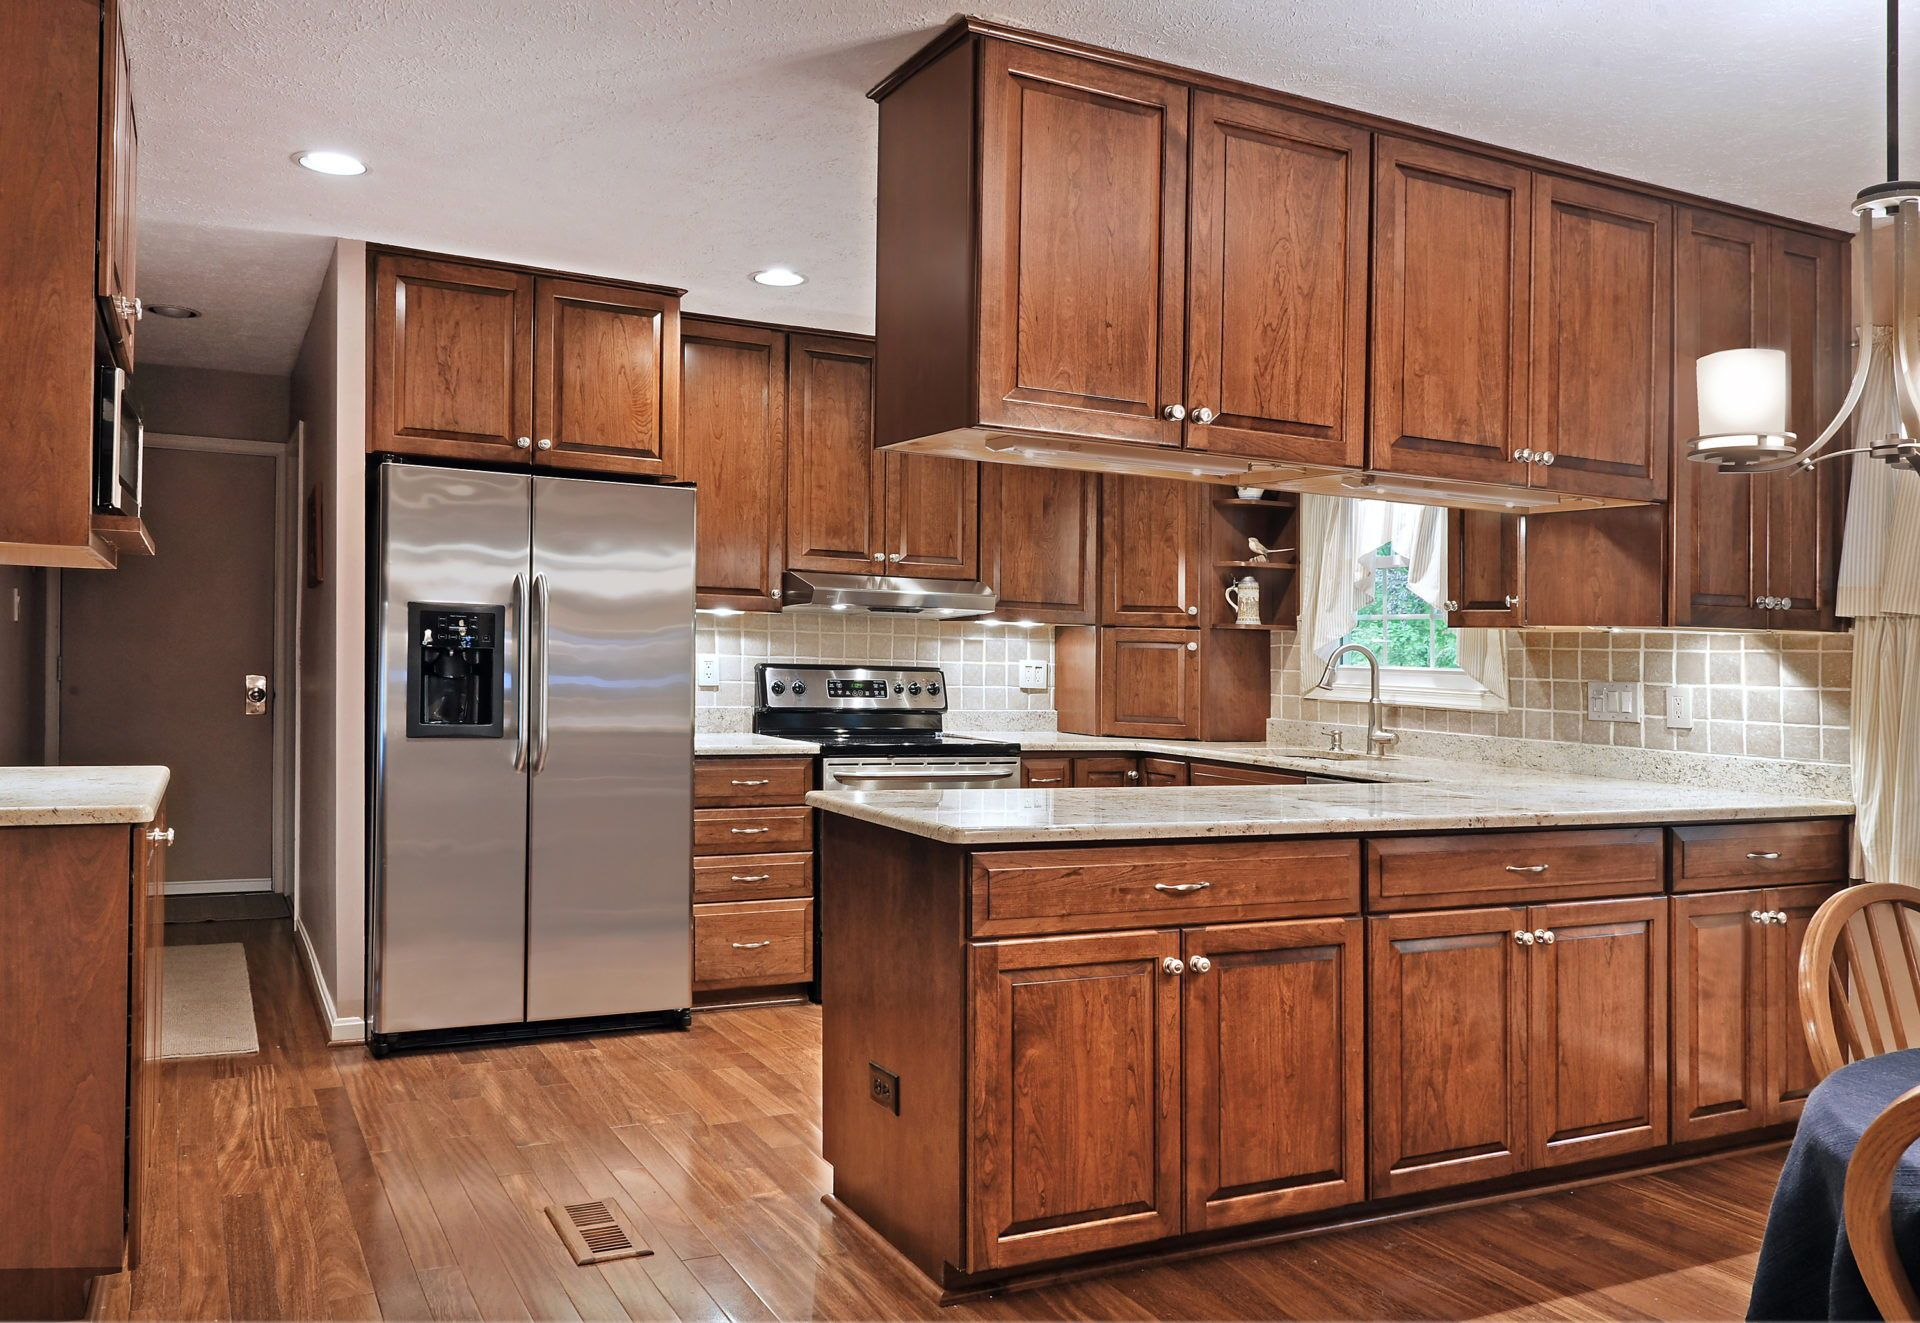 Traditional Chestnut Cherry Kitchen In Reston Va K S Renewal Systems Llc Bold Kitchen Cherry Kitchen U Shaped Kitchen